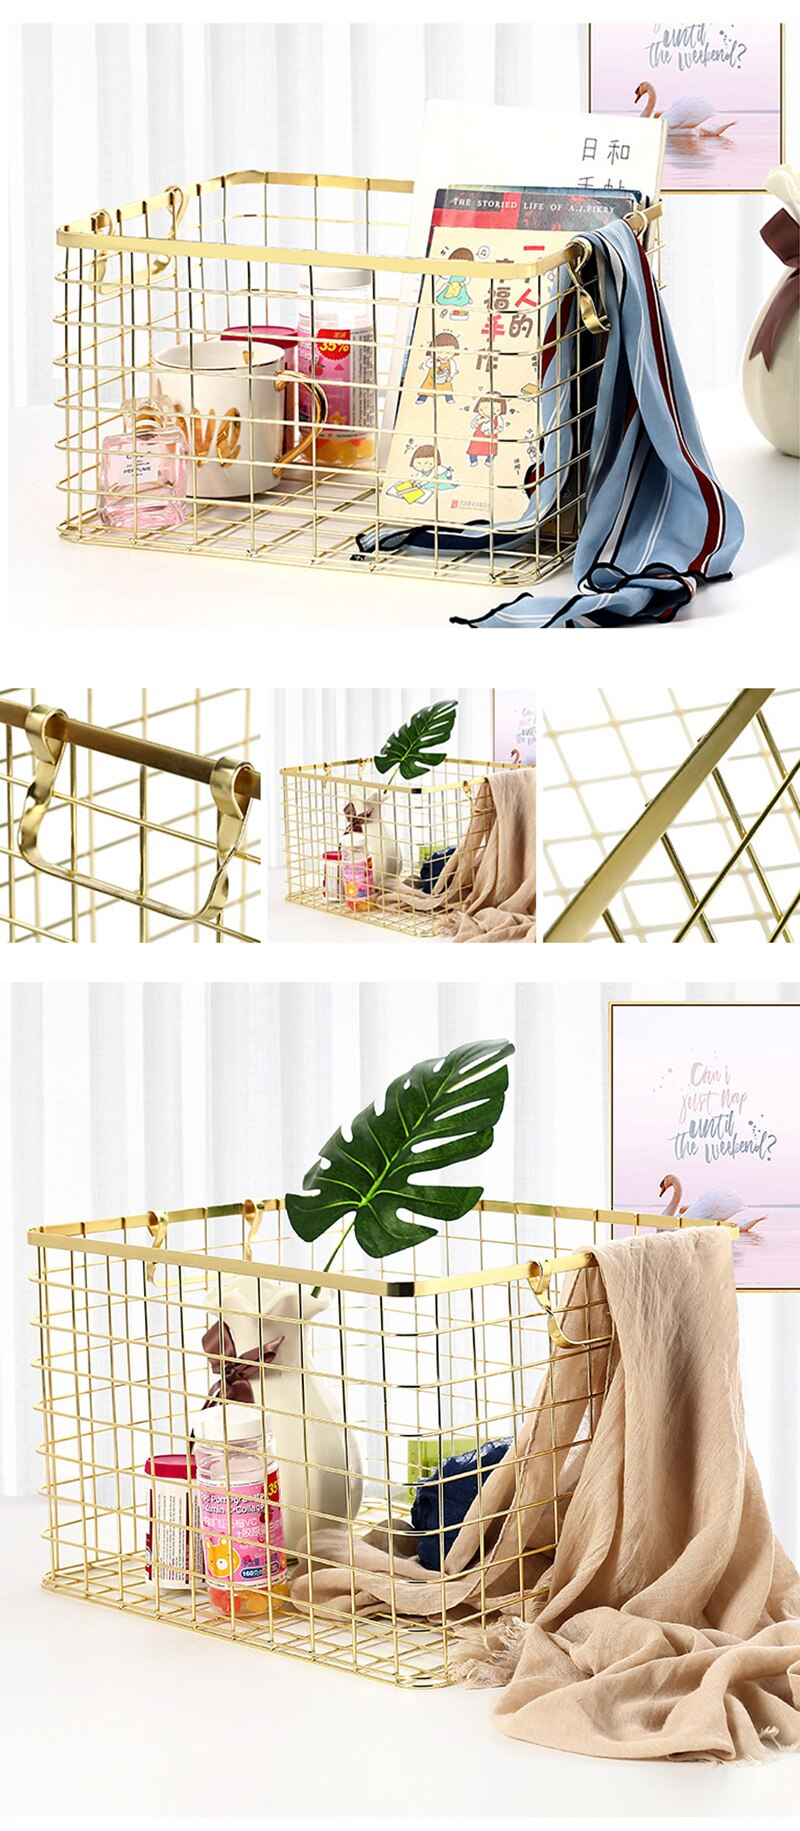 Nordic Style Metal Rose Gold Storage Basket Bath Clothes Cosmetics Storage Basket Office Sundries Organizer Home Decor Golden